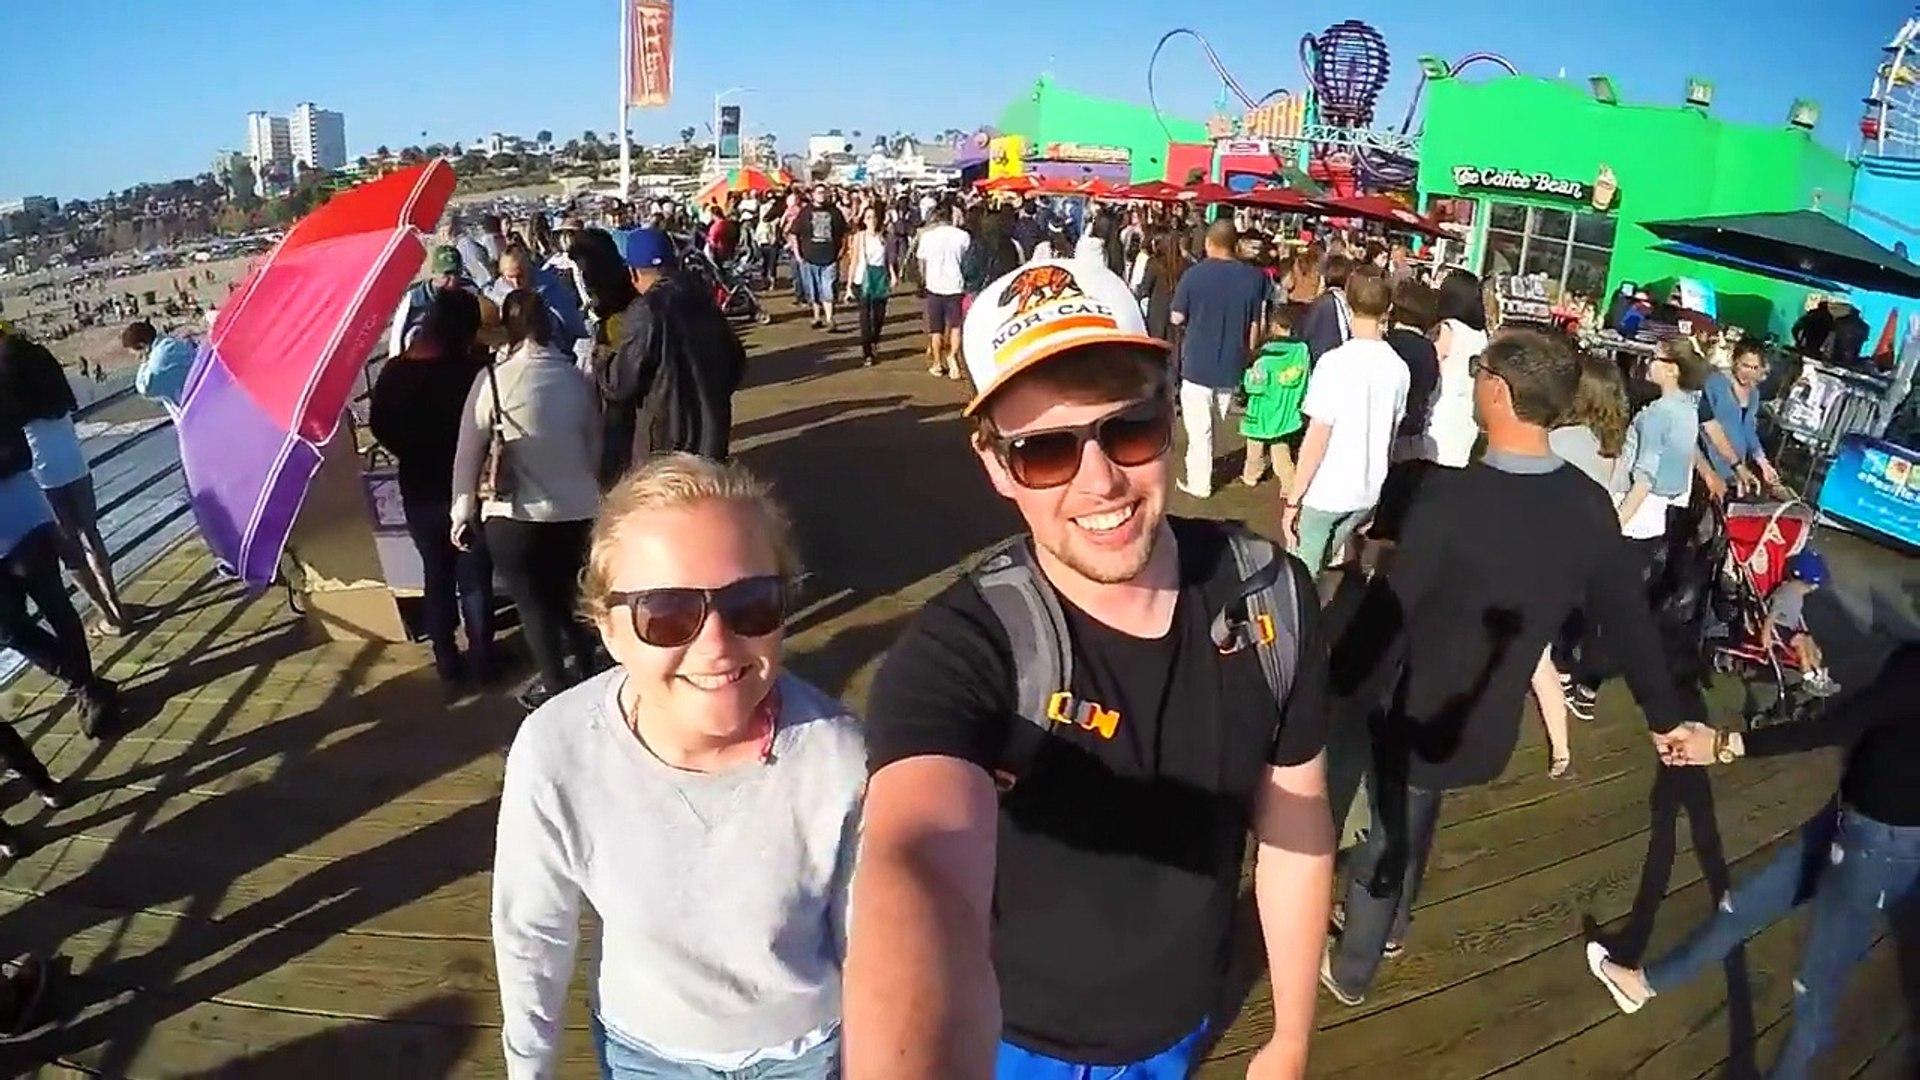 USA California Road Trip 2015 - GoPro Hero 4 Black - Full